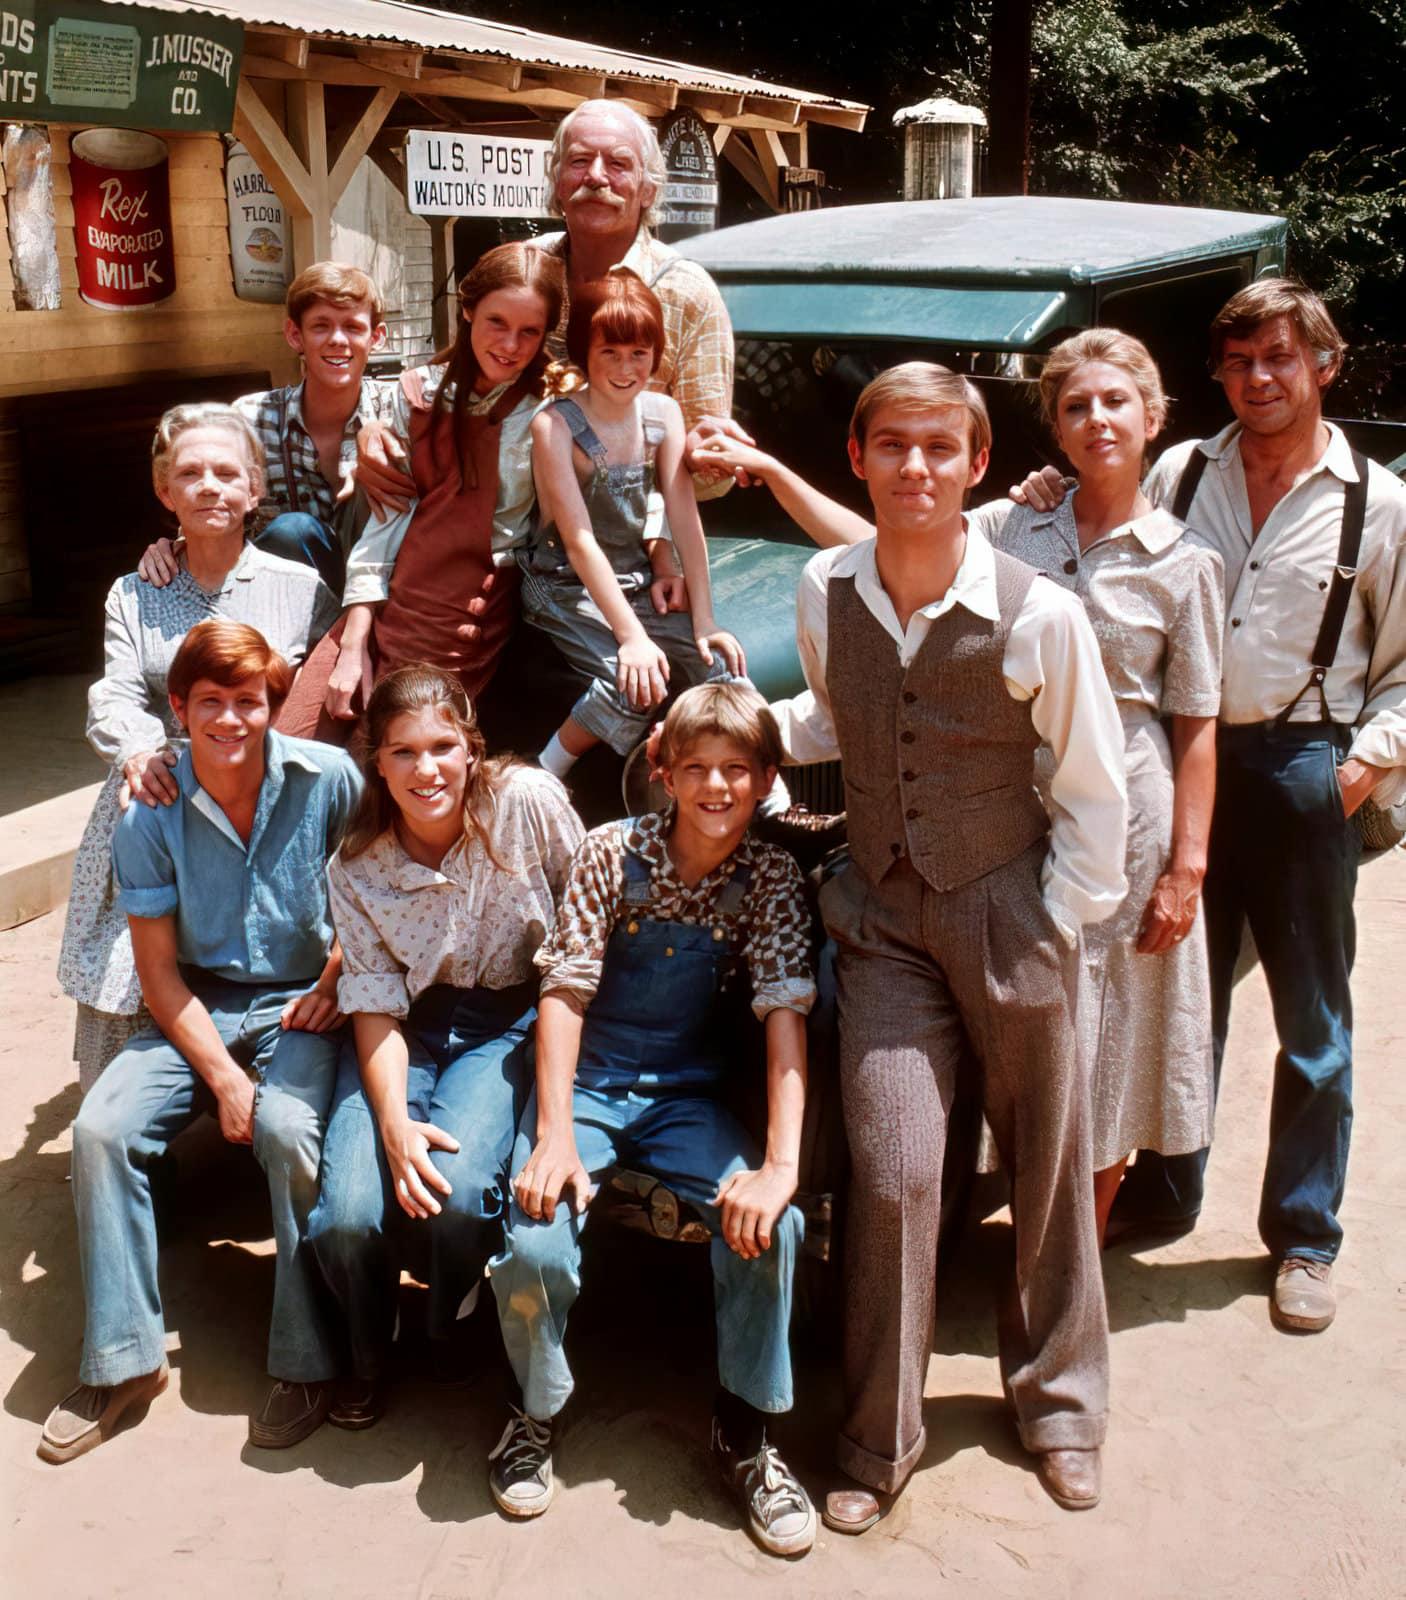 The Waltons TV show cast - 1970s